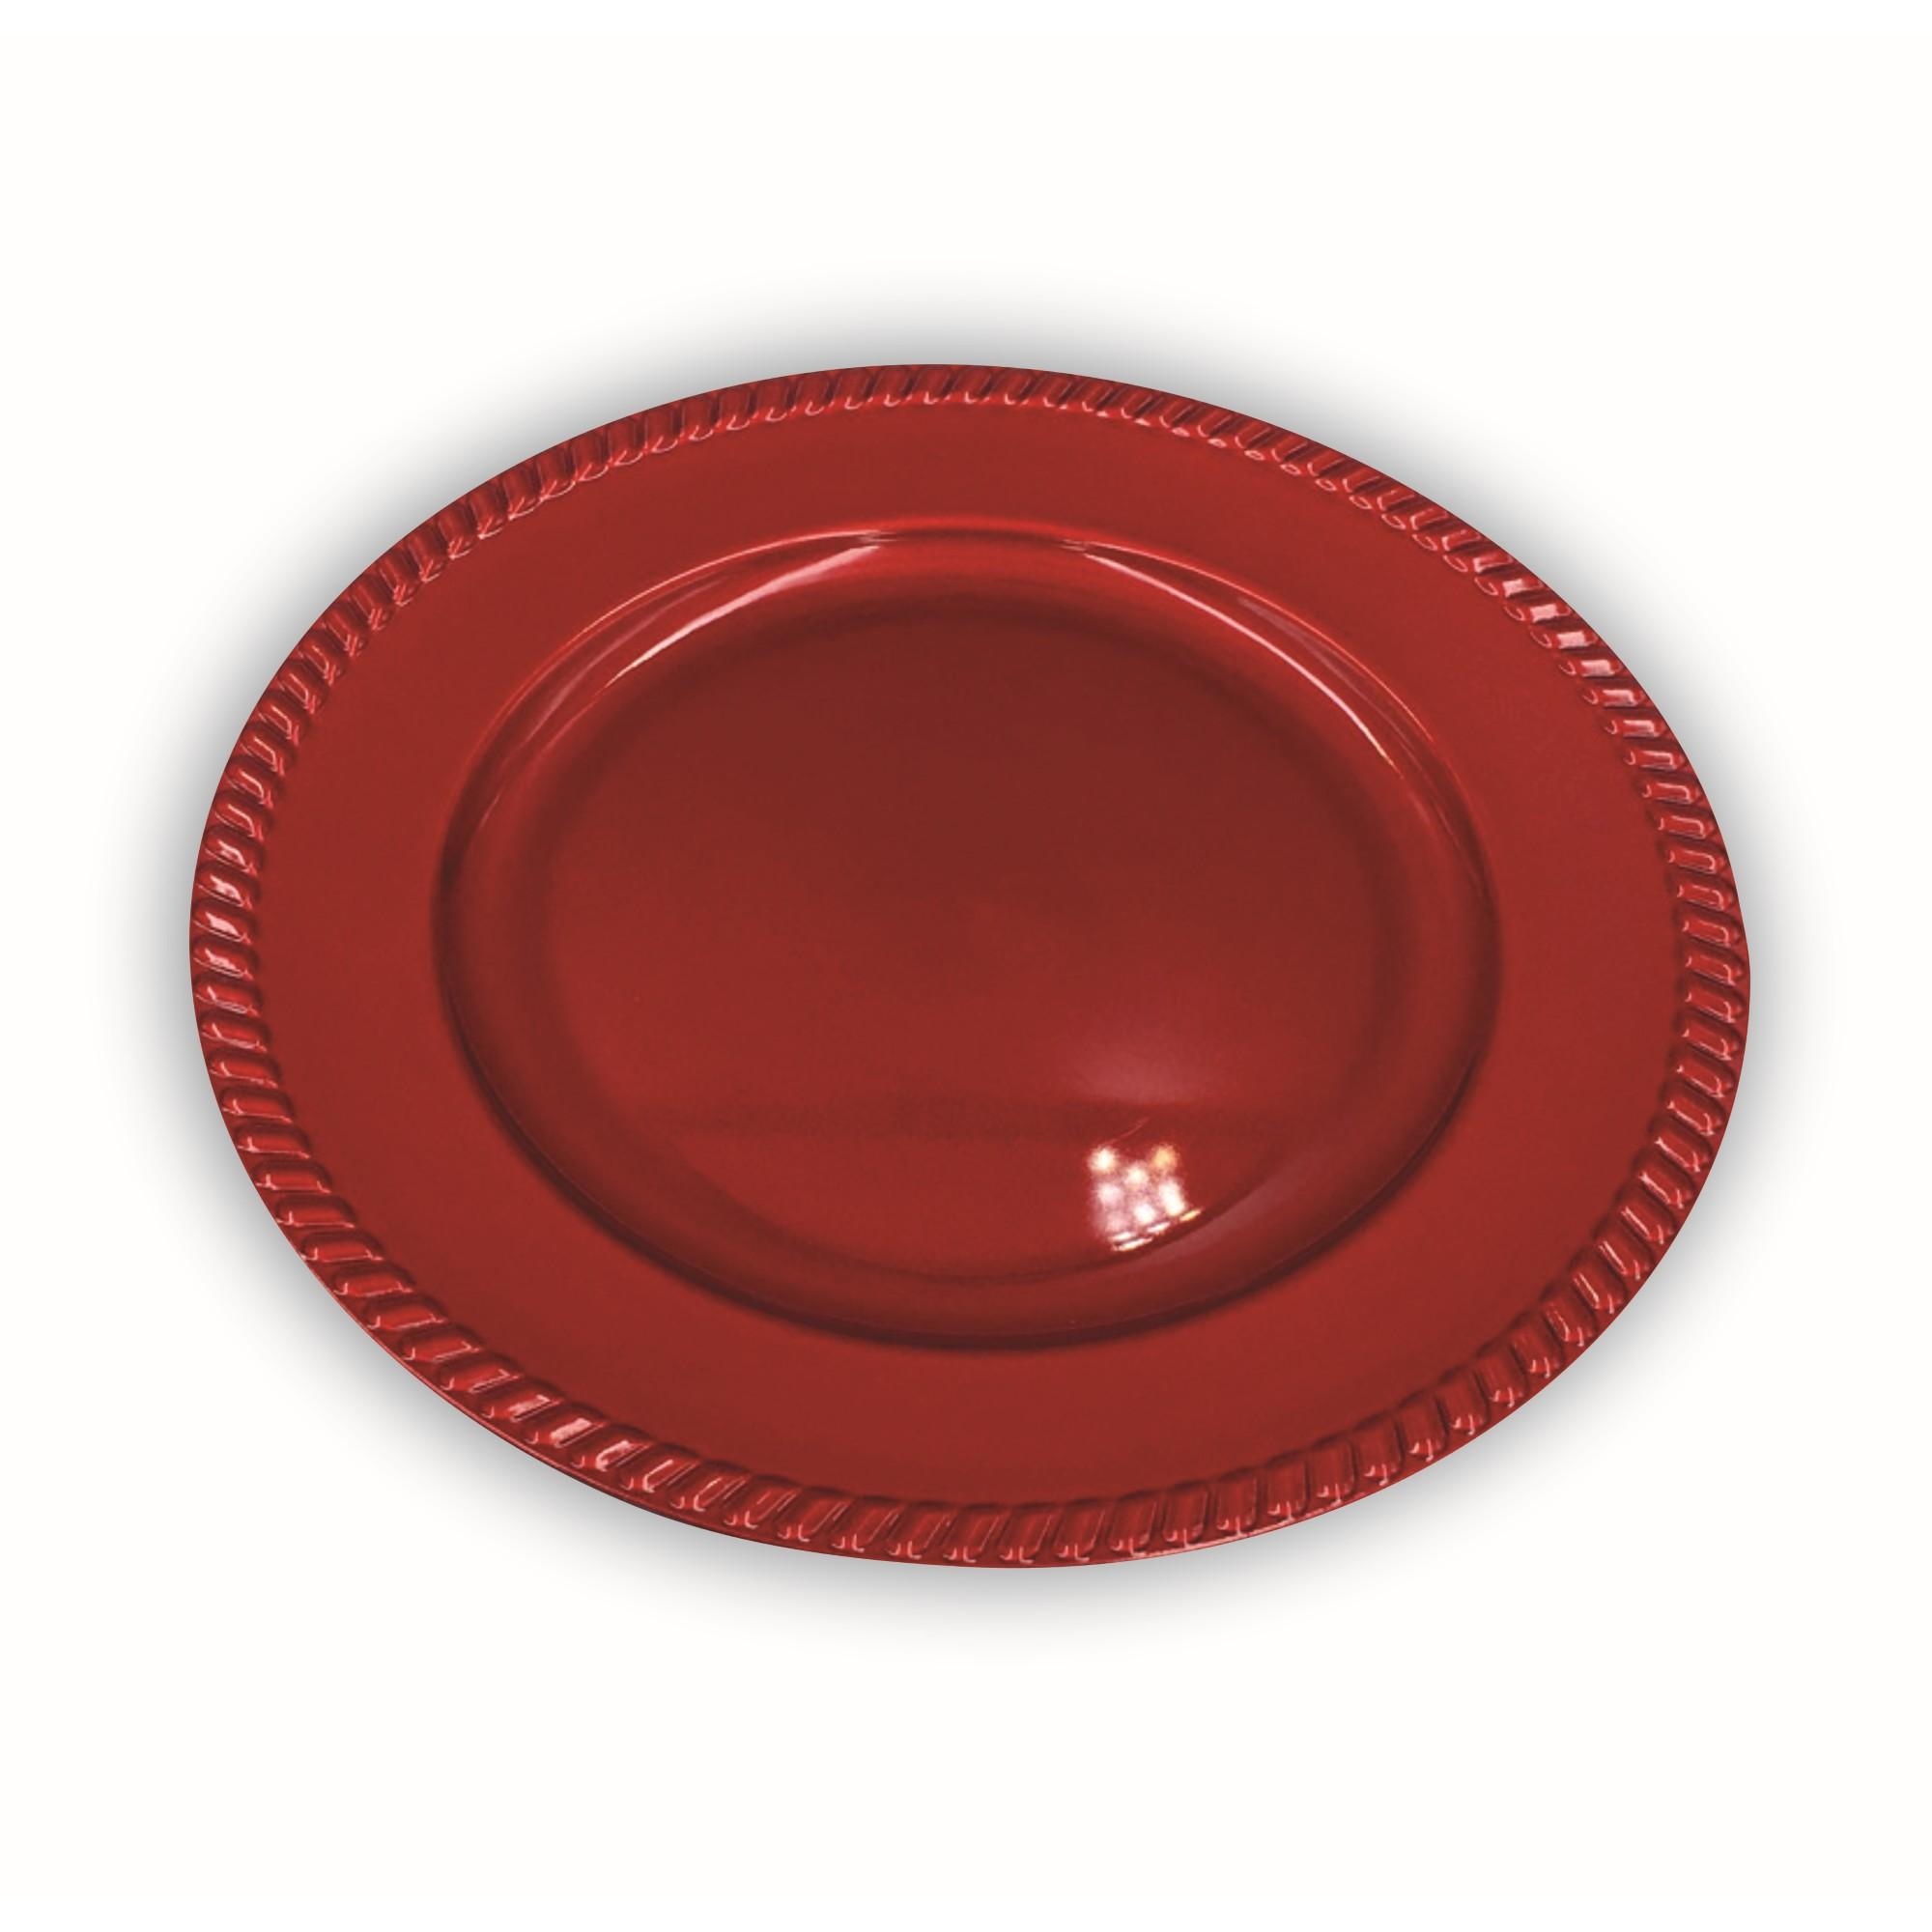 Sousplat de Plastico Redondo 33cm Vermelho - HLG111-R - Bianchini